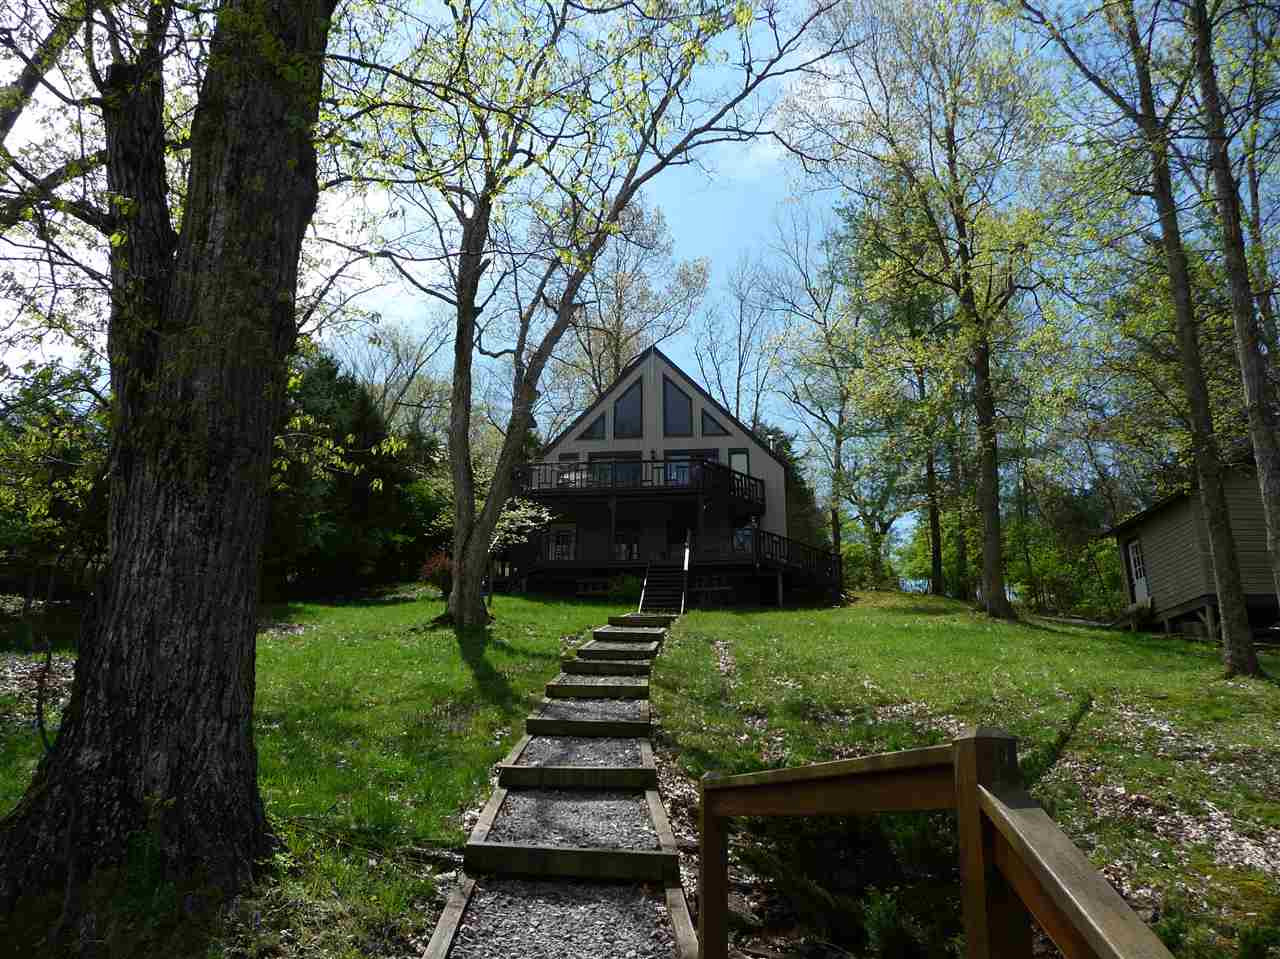 Photo 3 for 445 Elk Lake Resort Road, 1404 Owenton, KY 40359